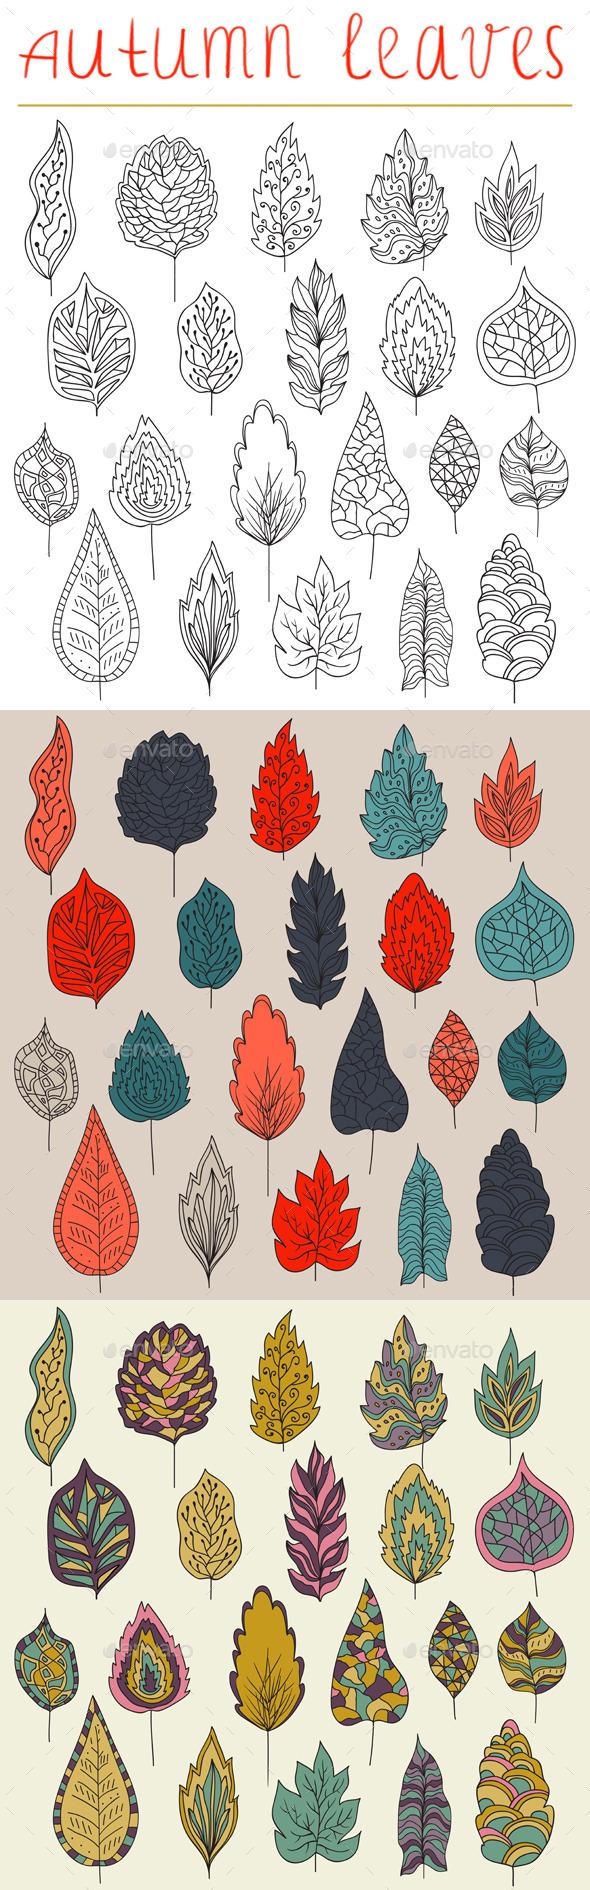 GraphicRiver Autumn Leaves 8980294